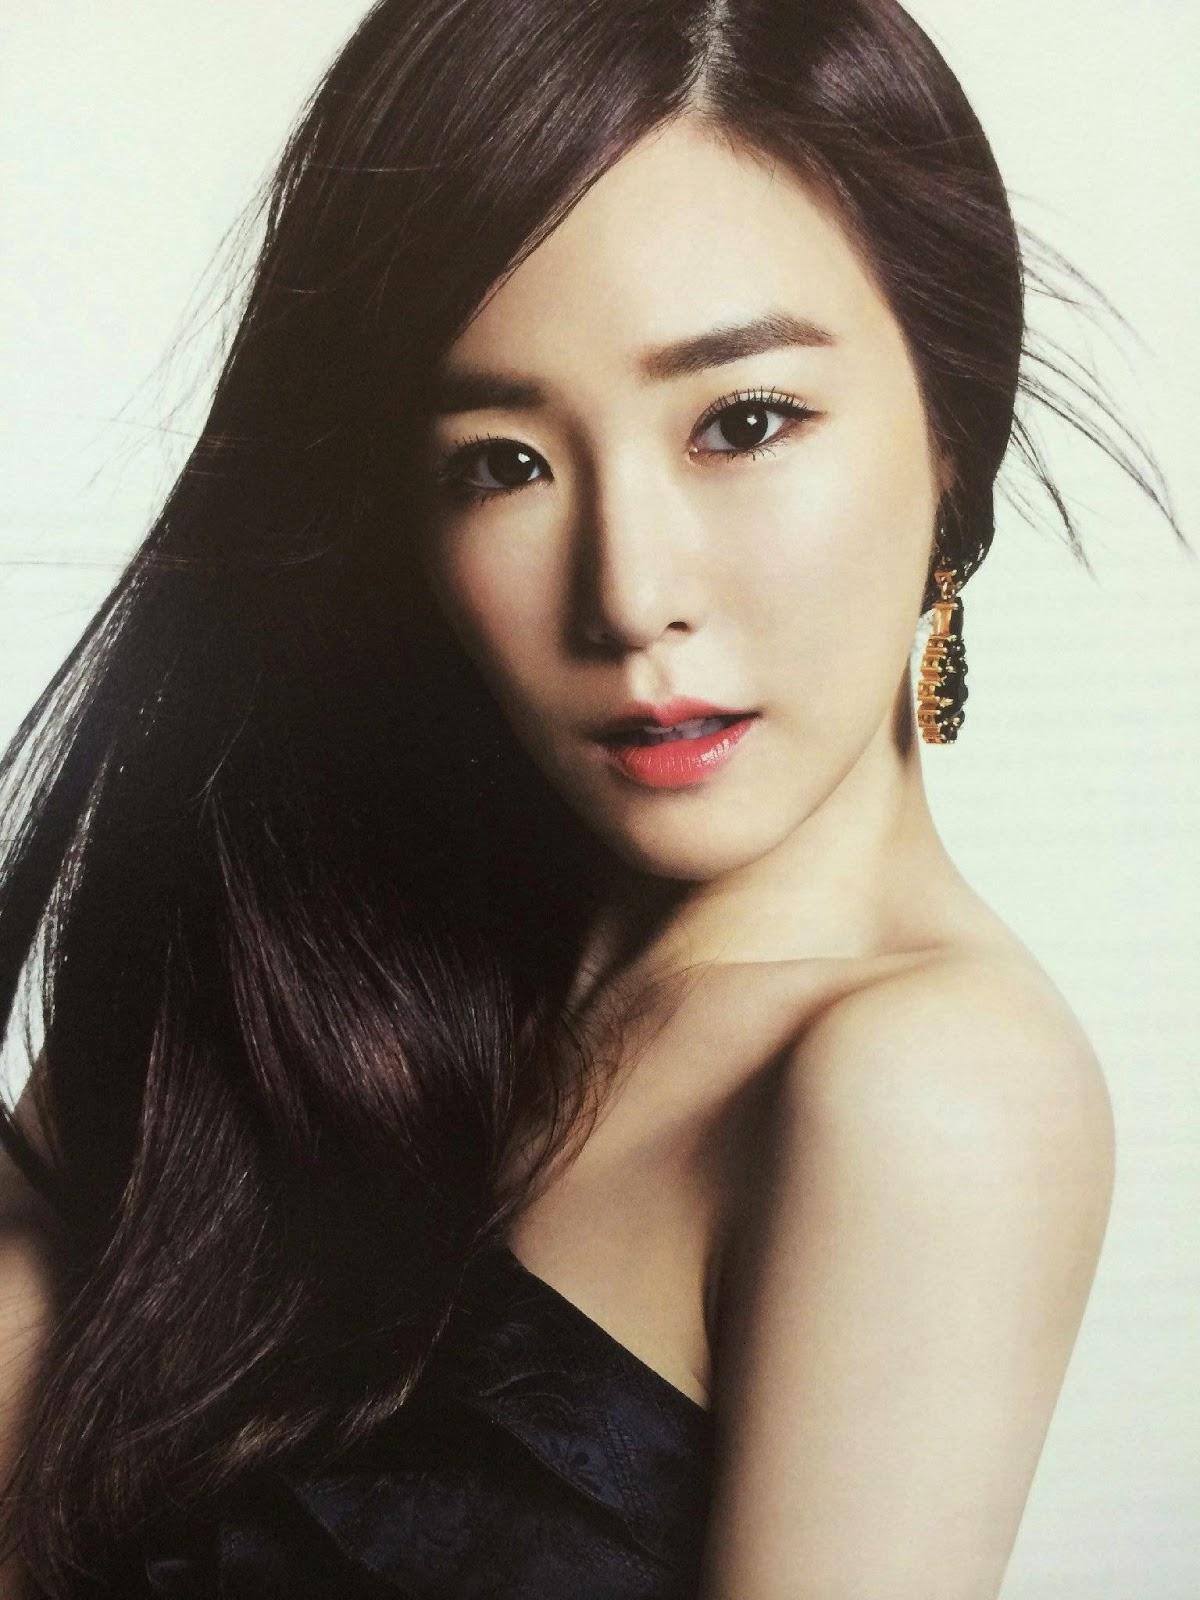 SNSD Tiffany (티파니; ティファニー) Girls Generation The Best Scan Photos